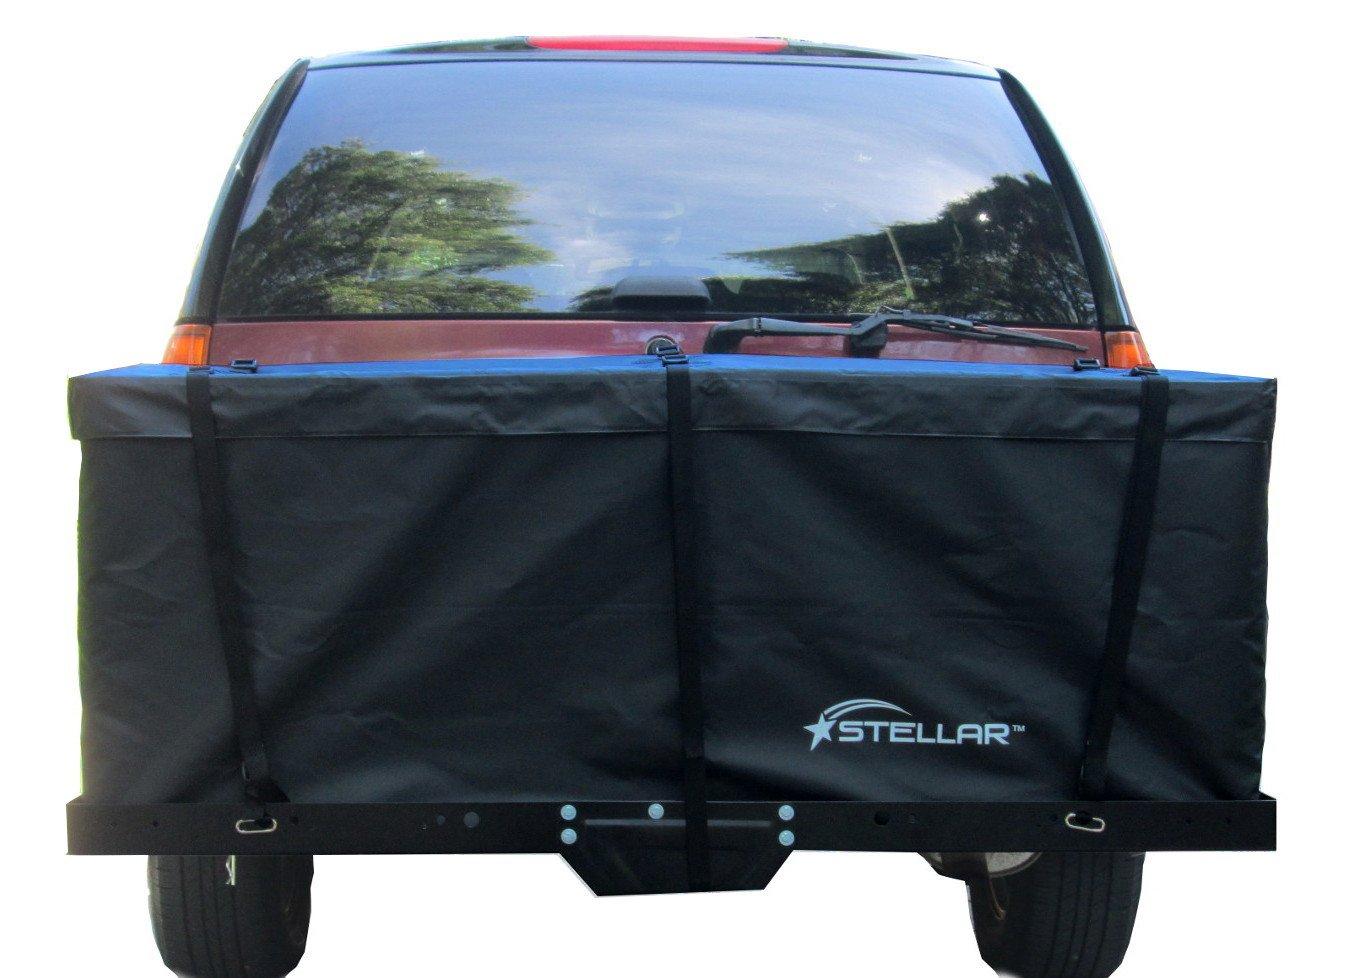 Stellar 10604 Large Waterproof Cargo Bag for Hitch Baskets- 59'' x 18.5'' x 24'' (15 Cu Ft)